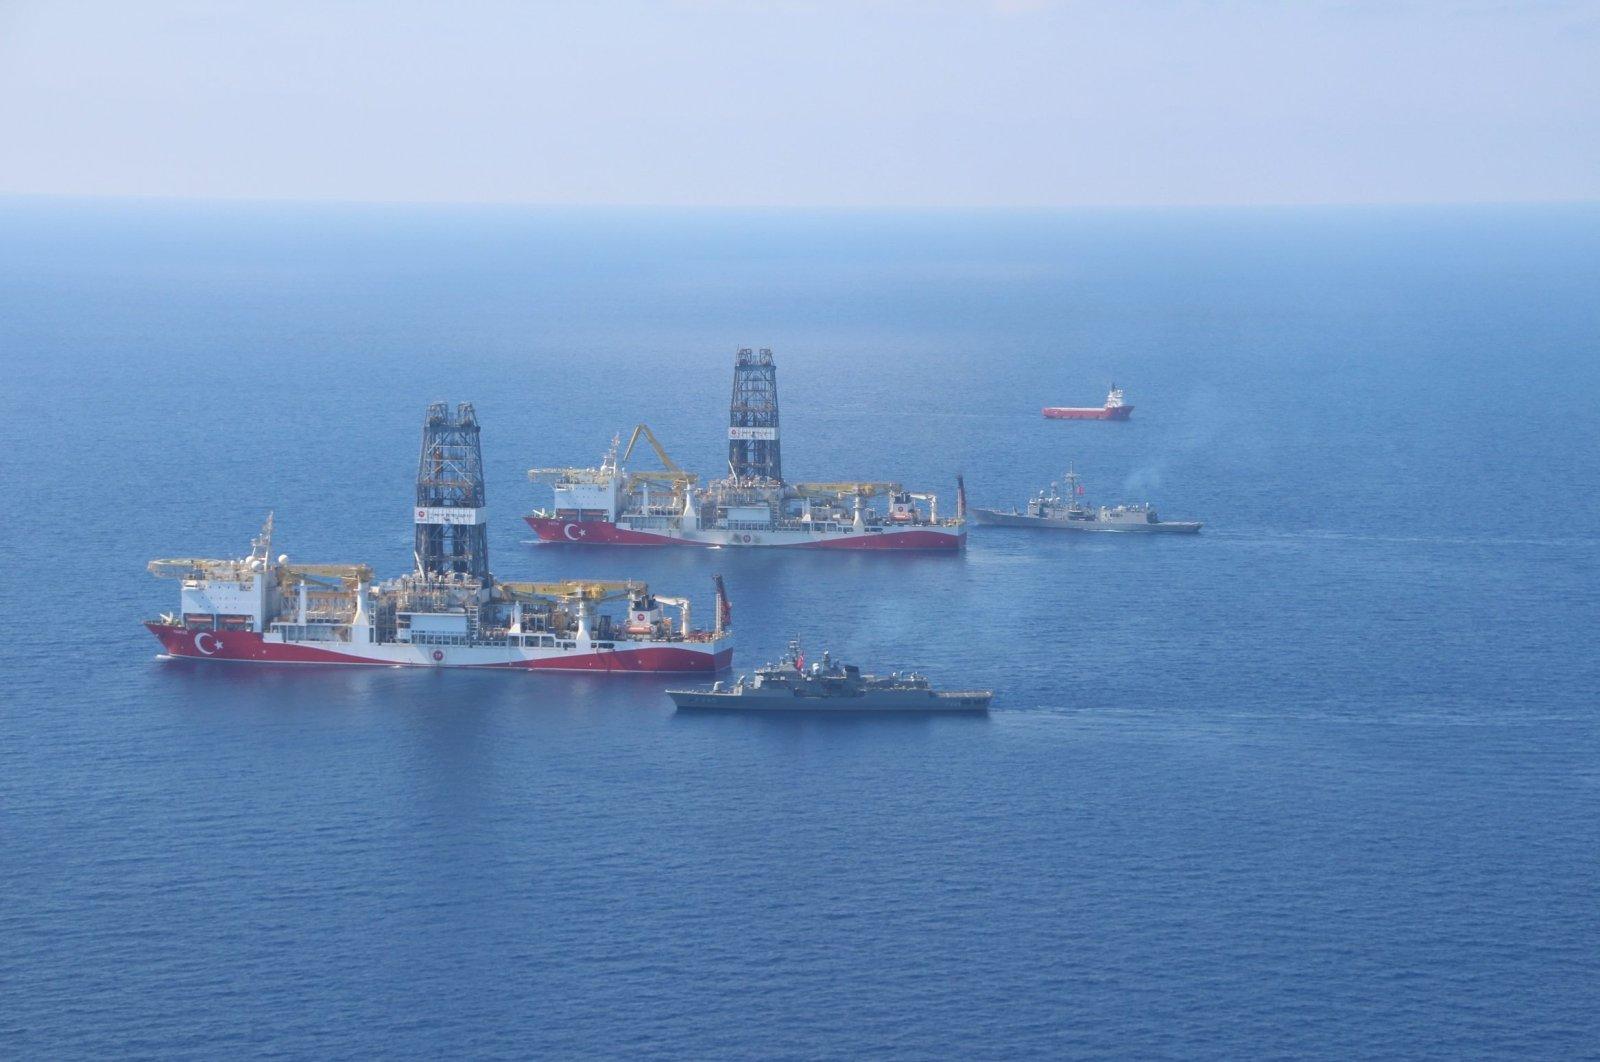 Turkey's drilling vessels Yavuz and Fatih in the Eastern Mediterranean on Aug. 10, 2020. (IHA Photo)